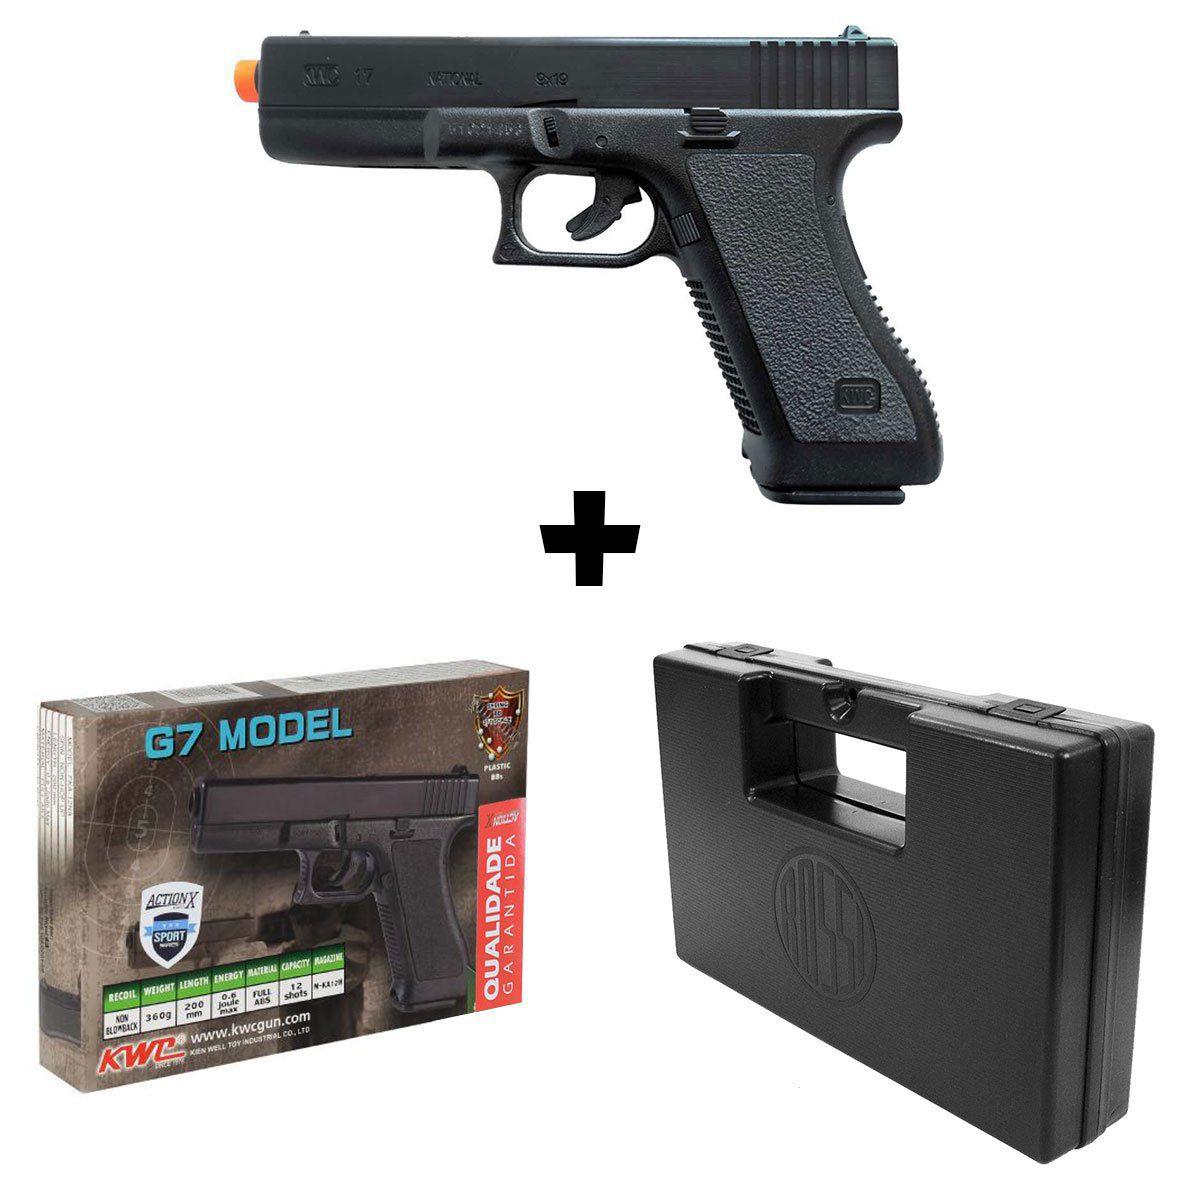 Pistola de Airsoft KWC Glock G7 Spring Calibre 6mm + Maleta